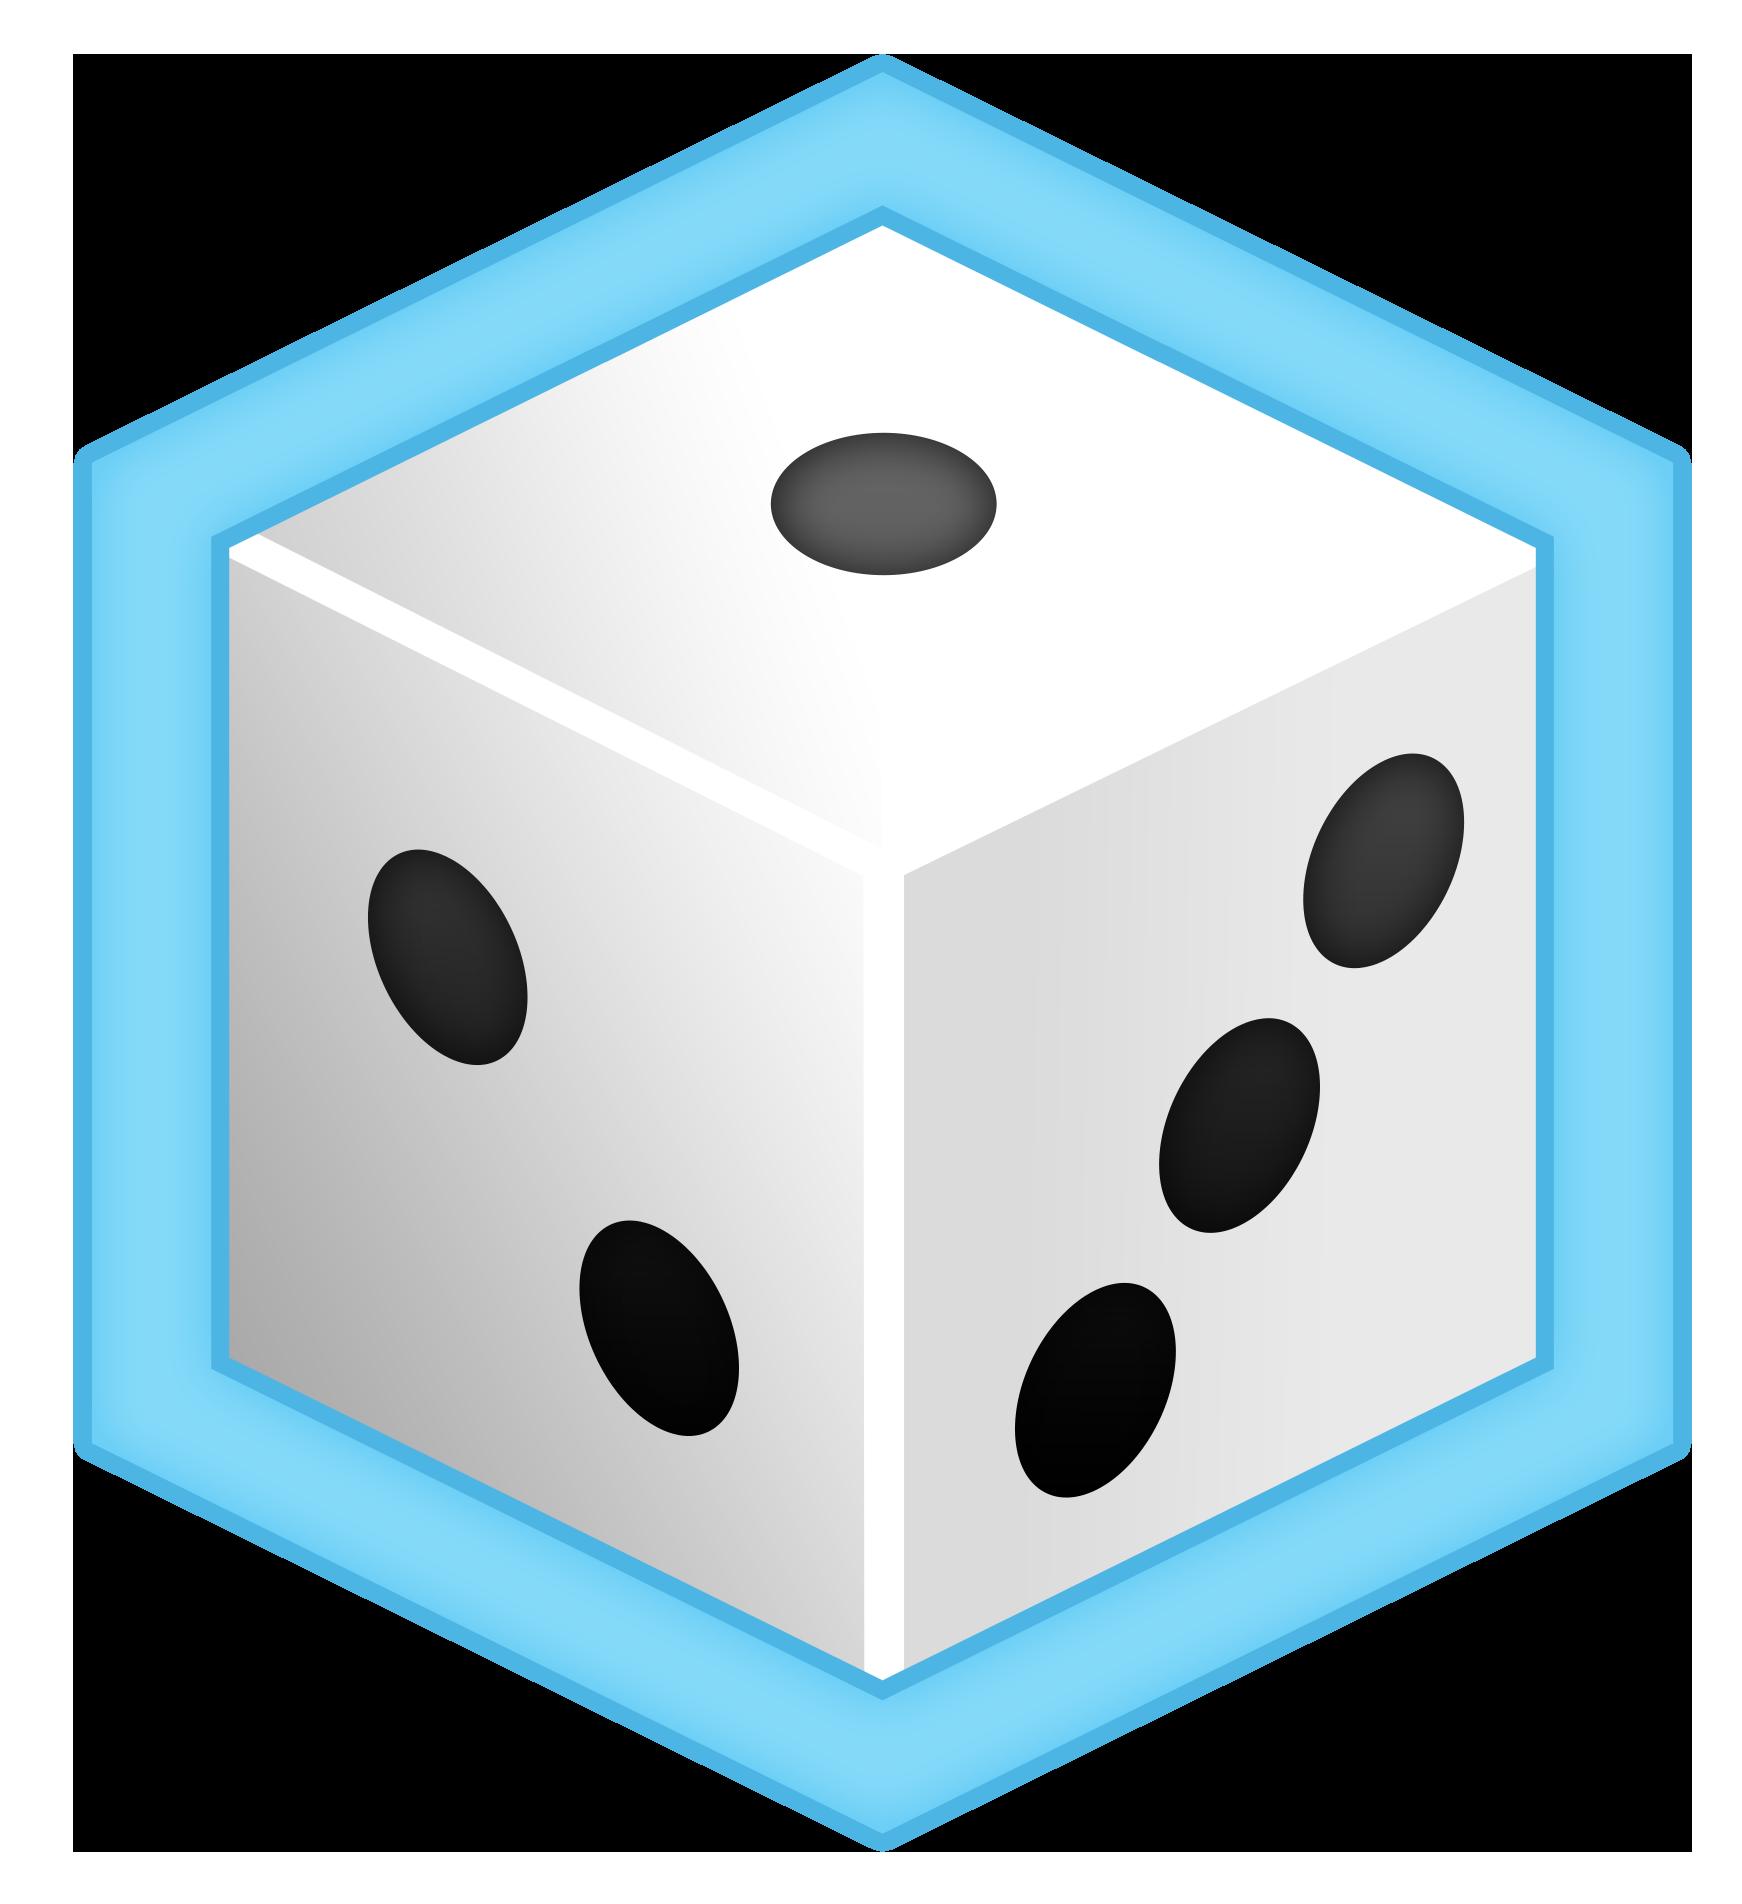 Games clipart board game. Donation oklahoma community dice